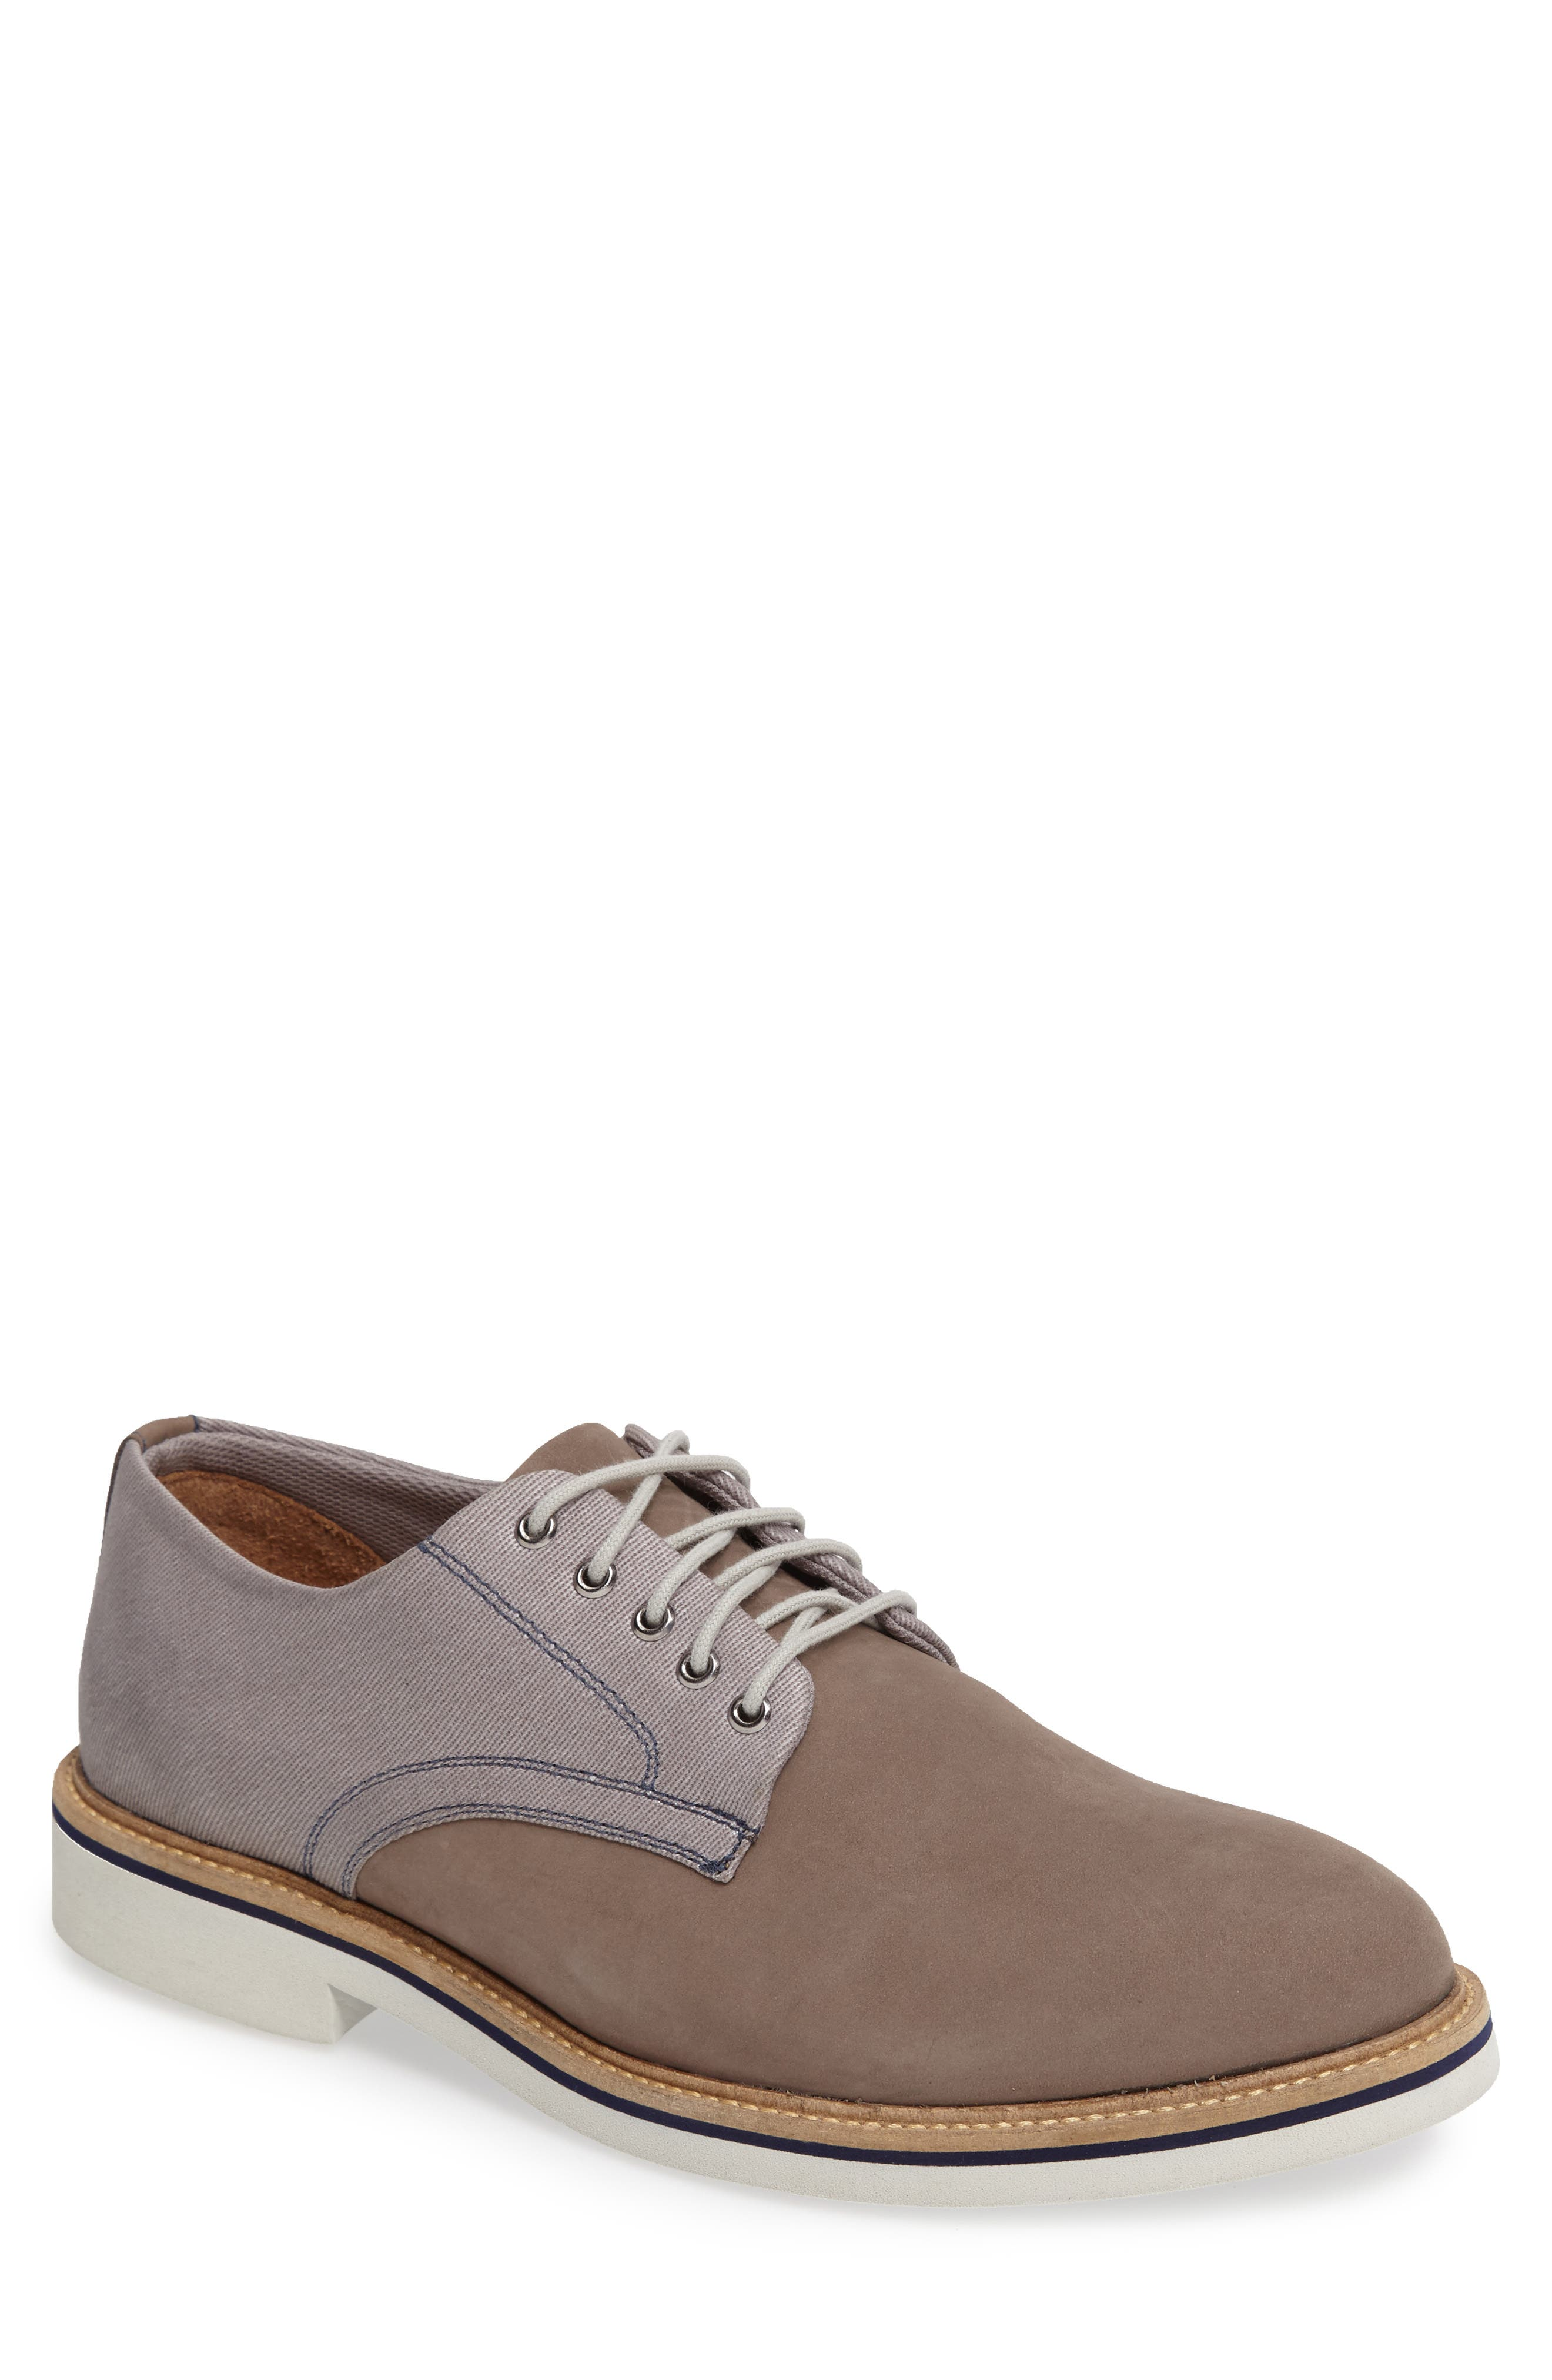 Alternate Image 1 Selected - 1901 Jefferson Buck Shoe (Men)